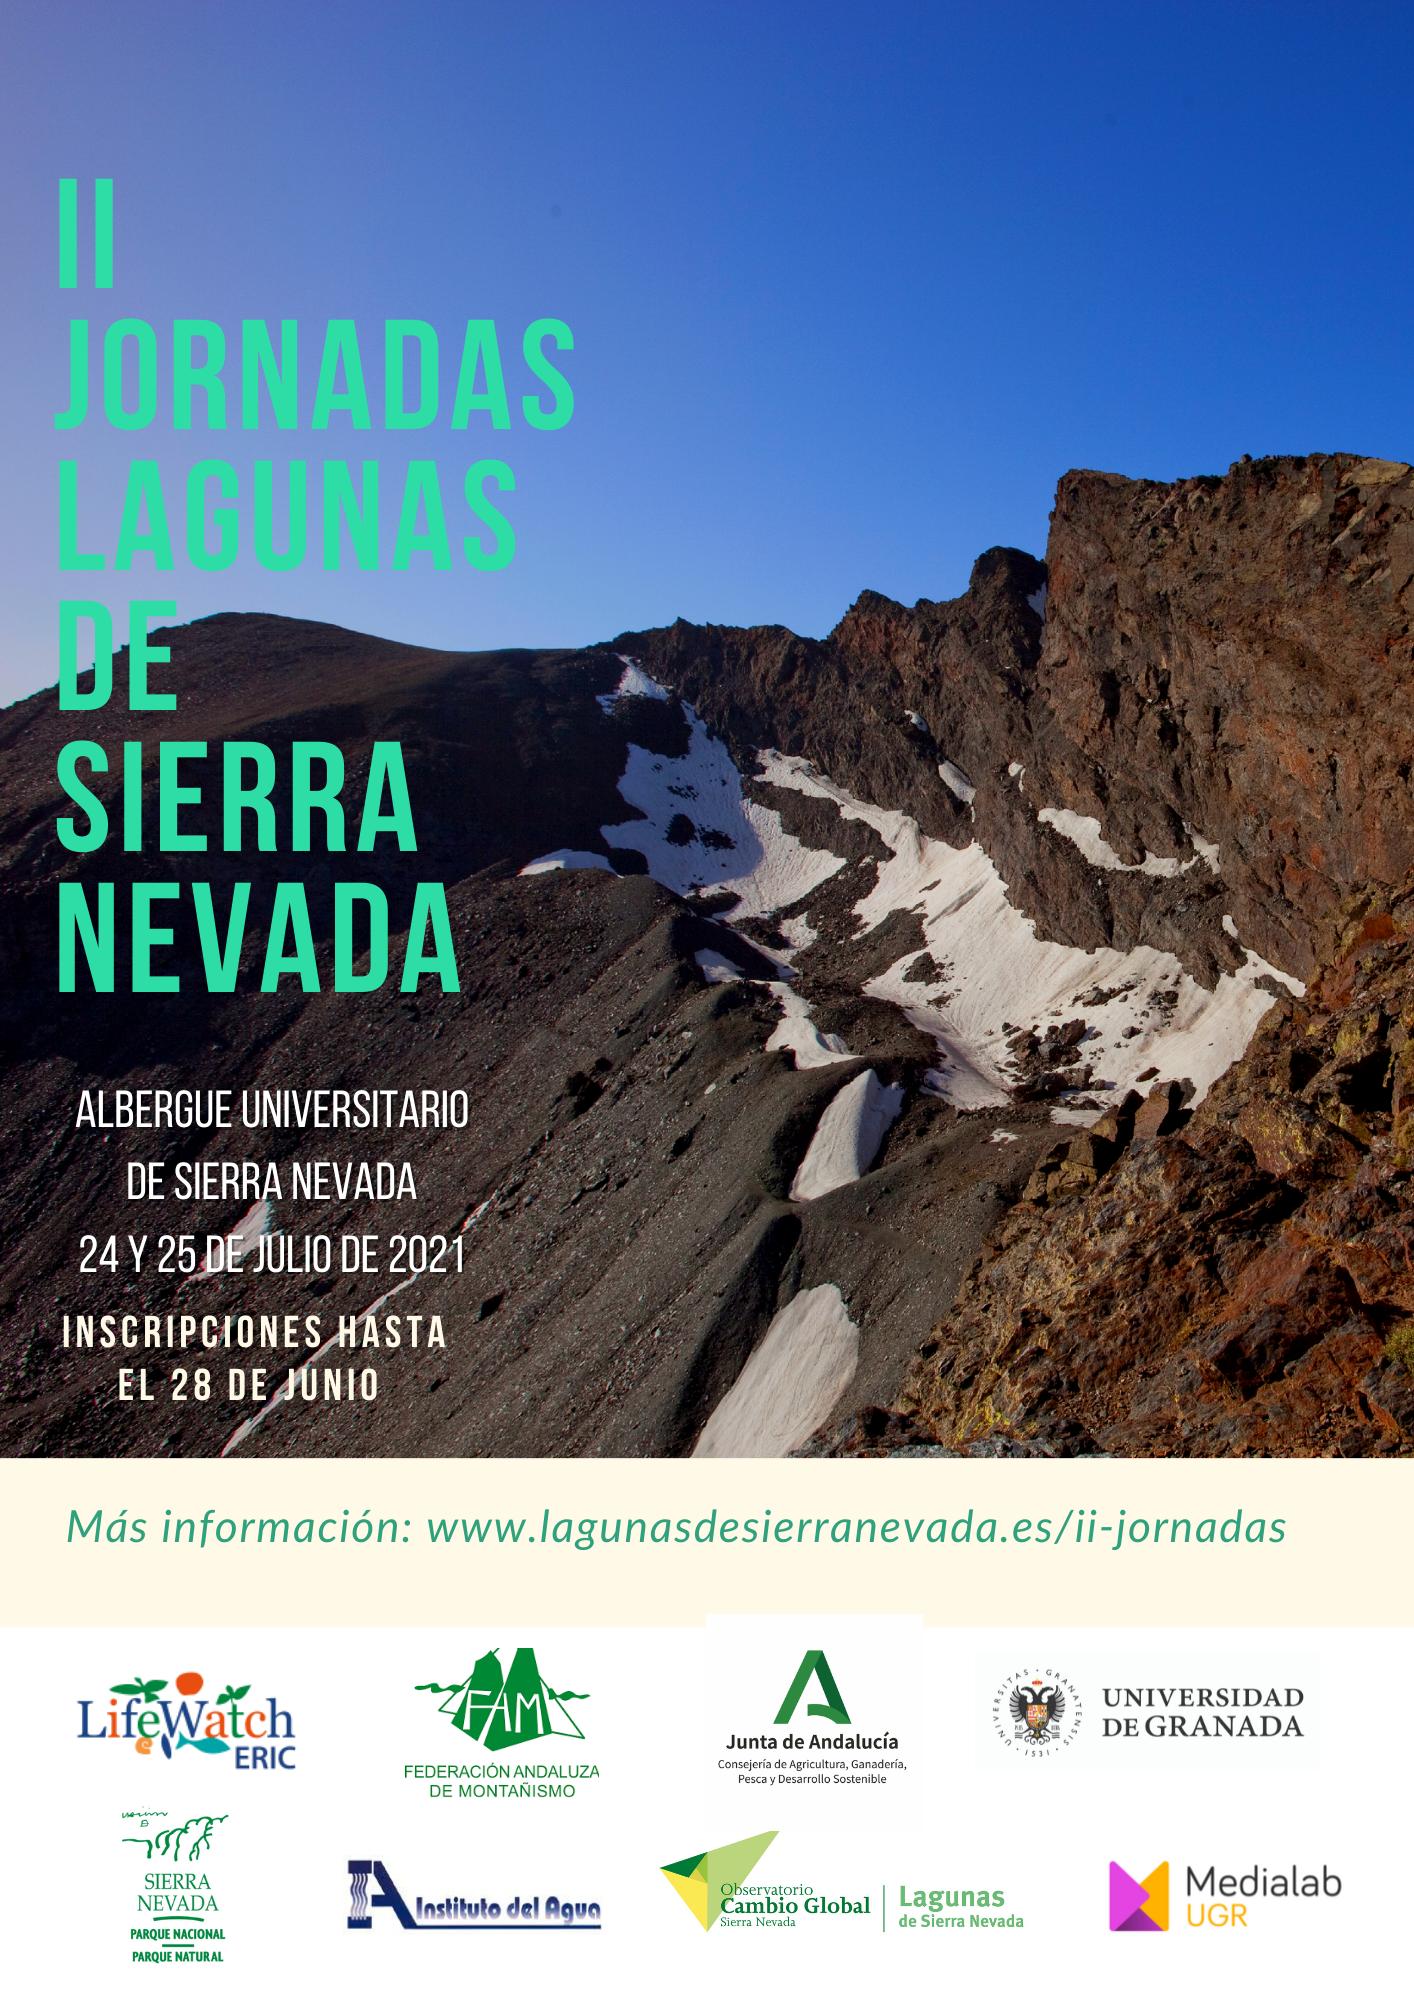 II jornadas lagunas de Sierra Nevada